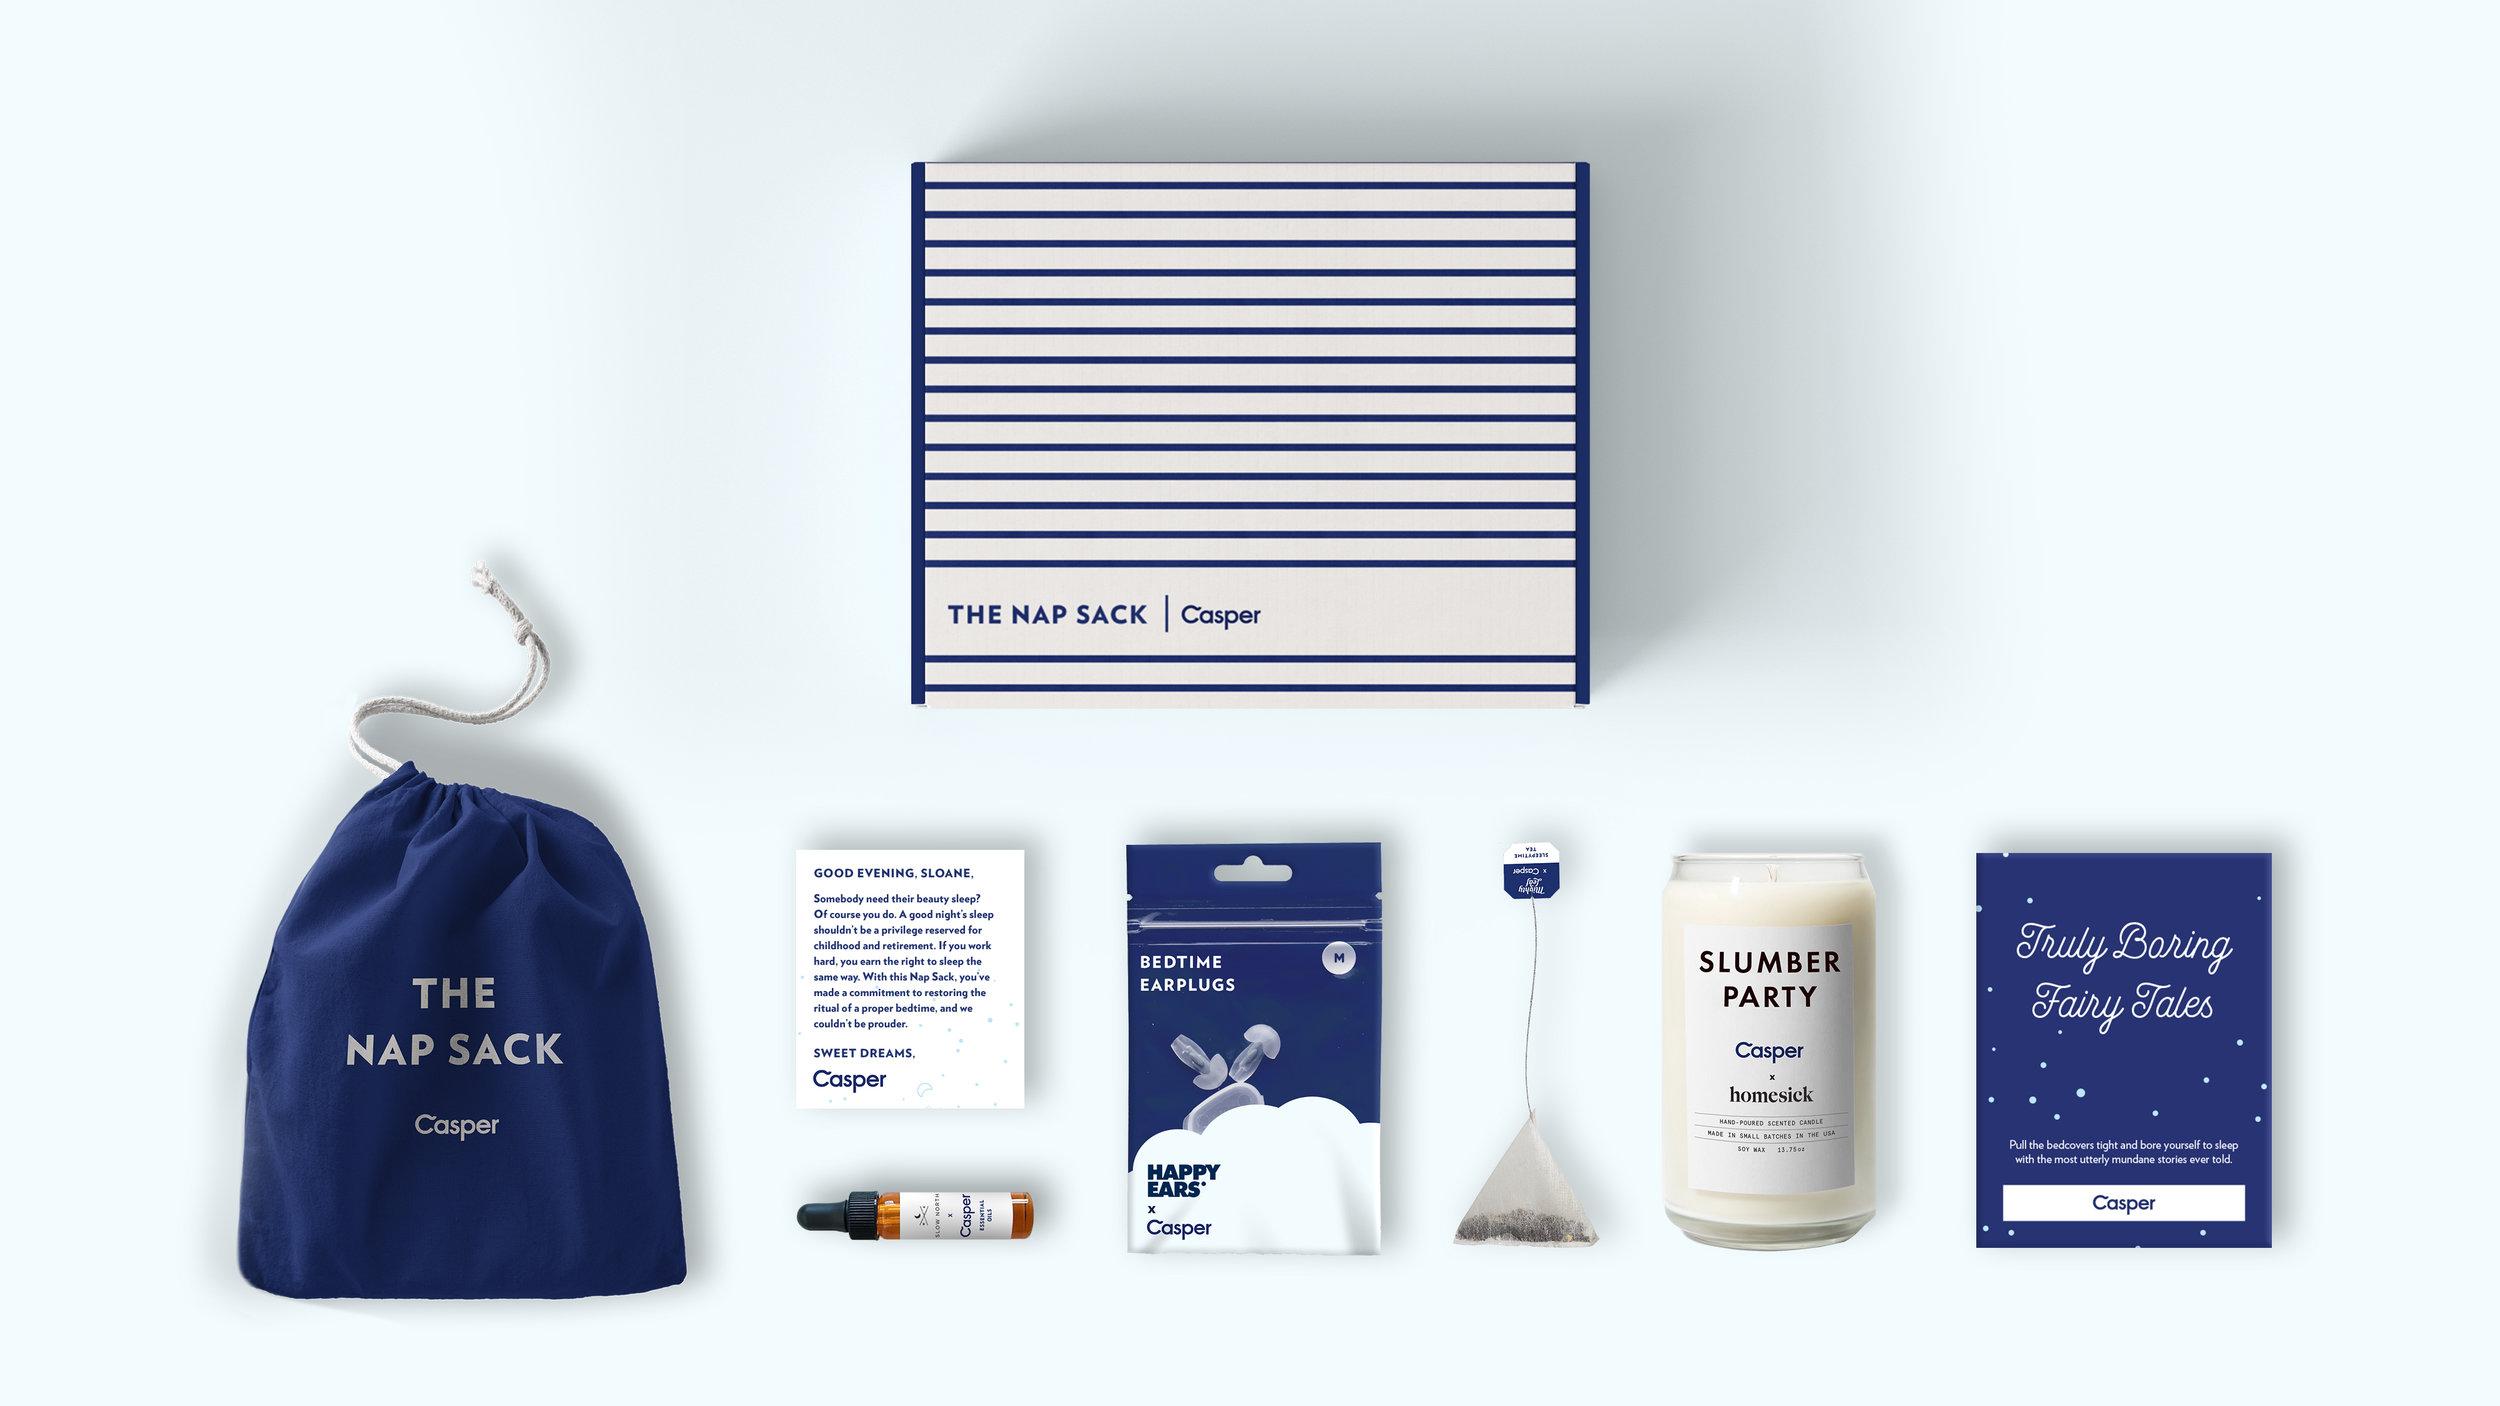 A box, bag, tea, and candle